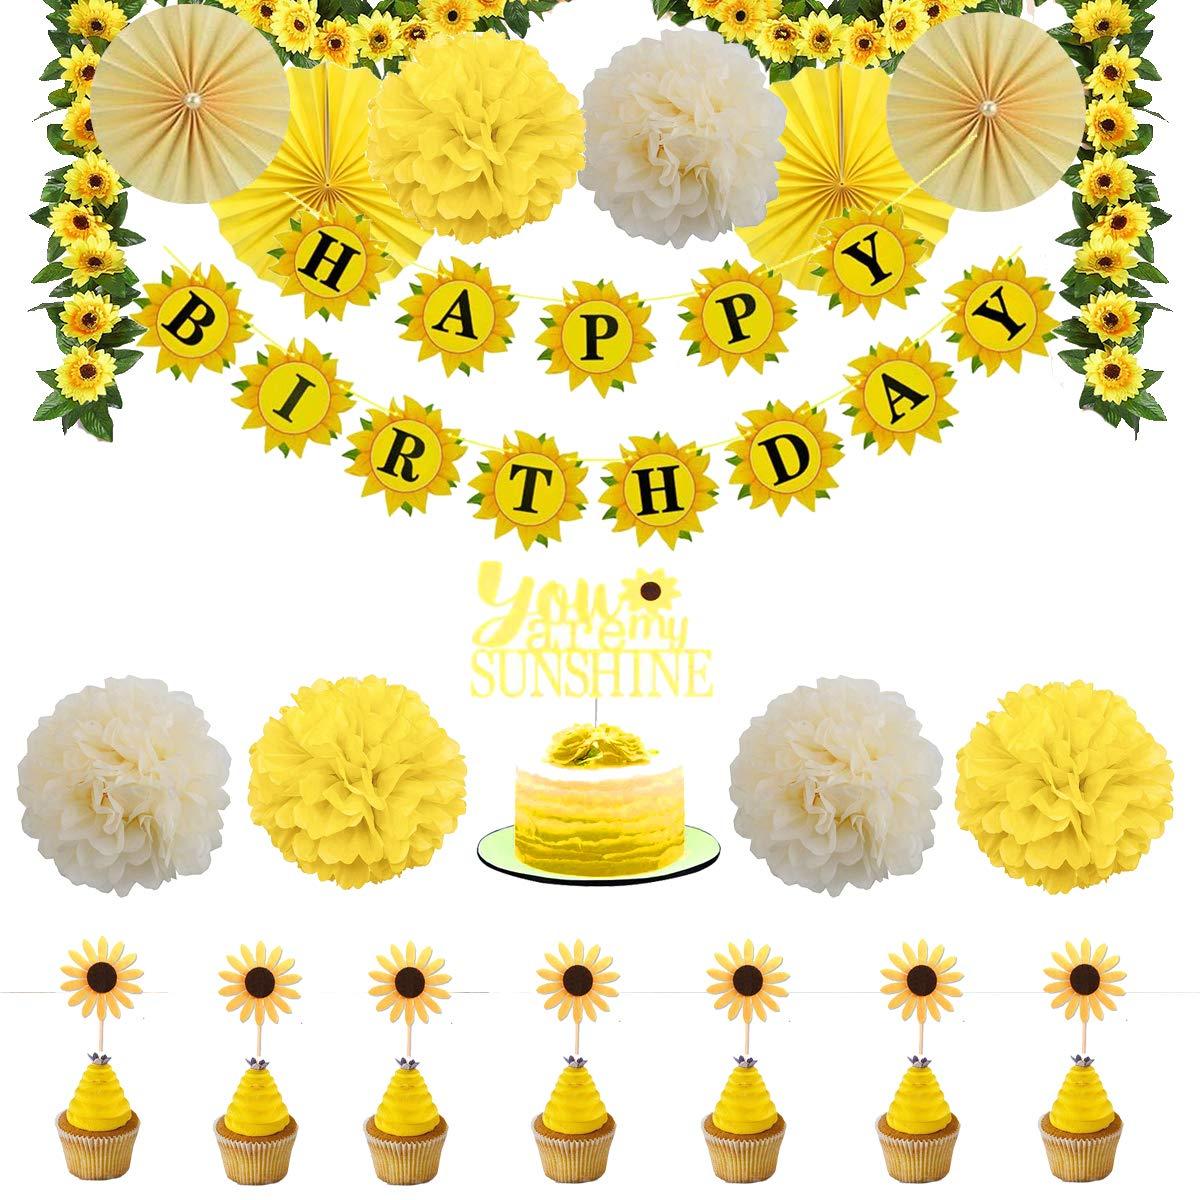 Tremendous Sunflower Birthday Party Decorations Supplies Kit Sunflower Happy Funny Birthday Cards Online Necthendildamsfinfo